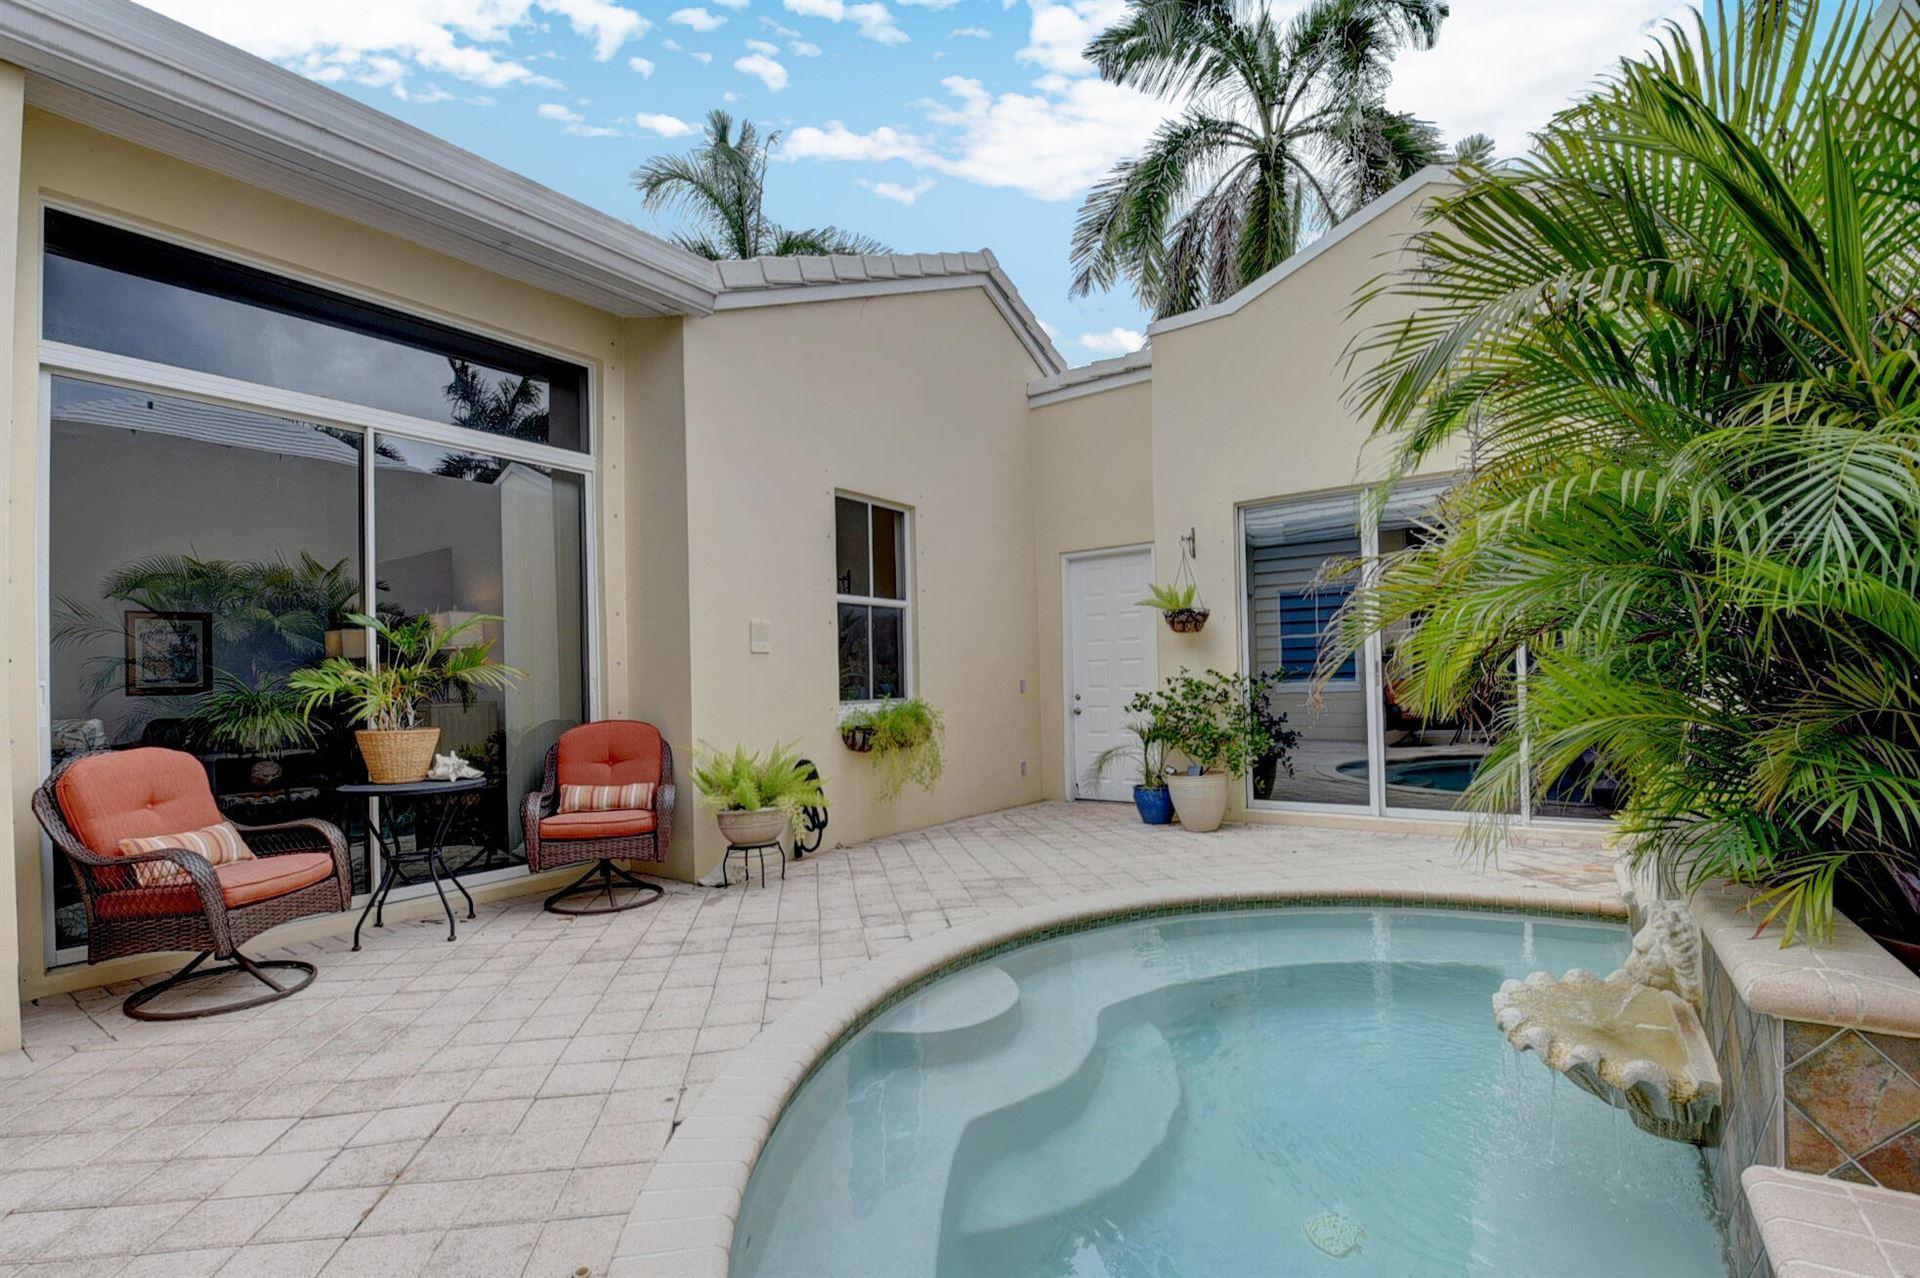 17143 Bermuda Village Drive, Boca Raton, FL 33487 - #: RX-10743438